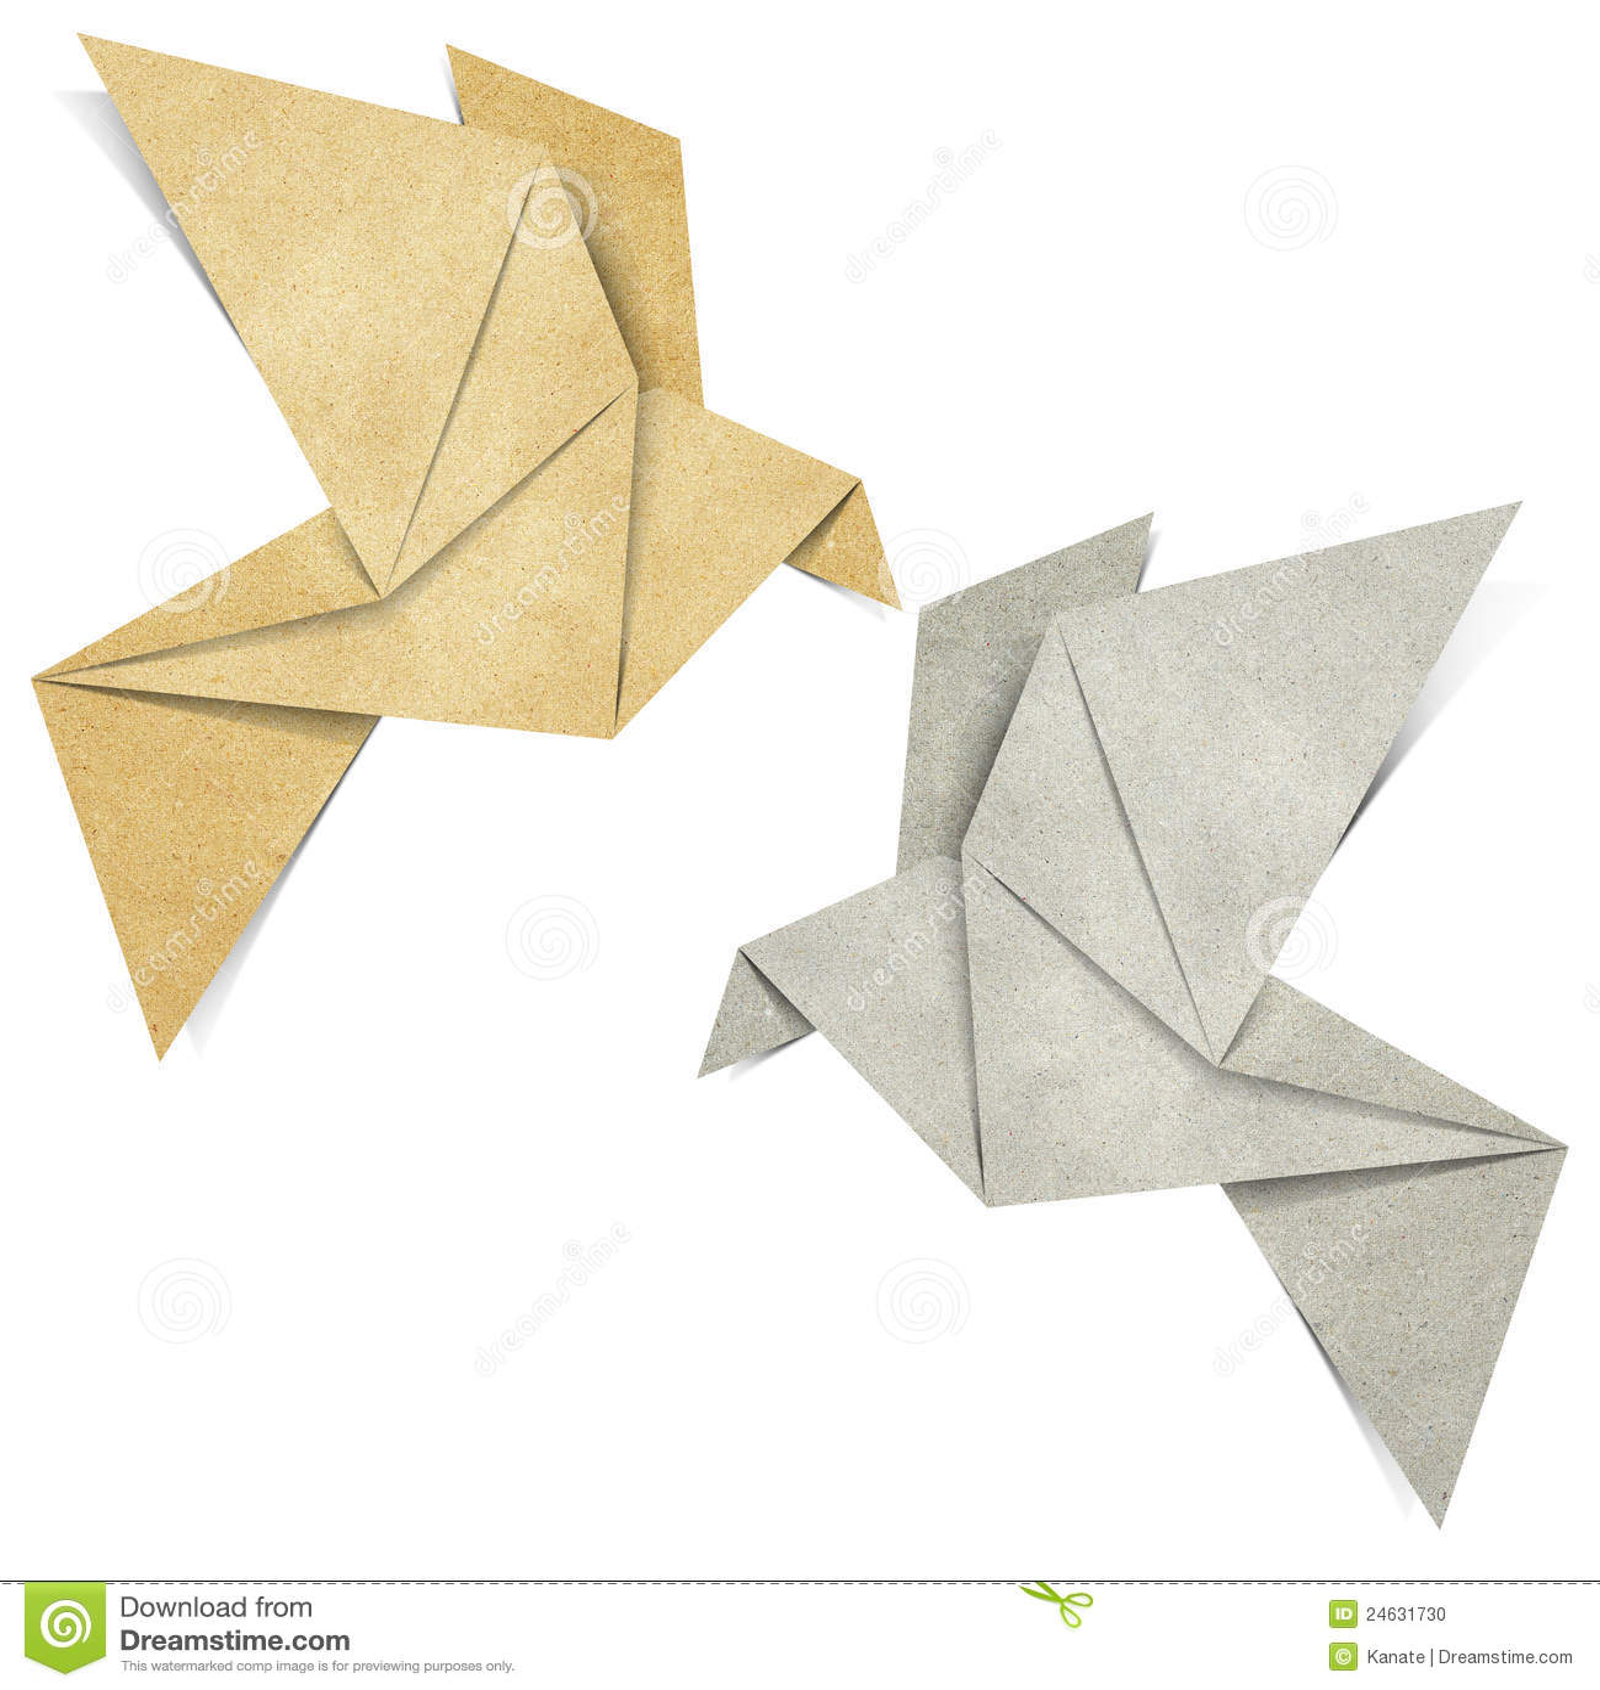 le papercraft d 39 oiseau d 39 origami effectu partir. Black Bedroom Furniture Sets. Home Design Ideas